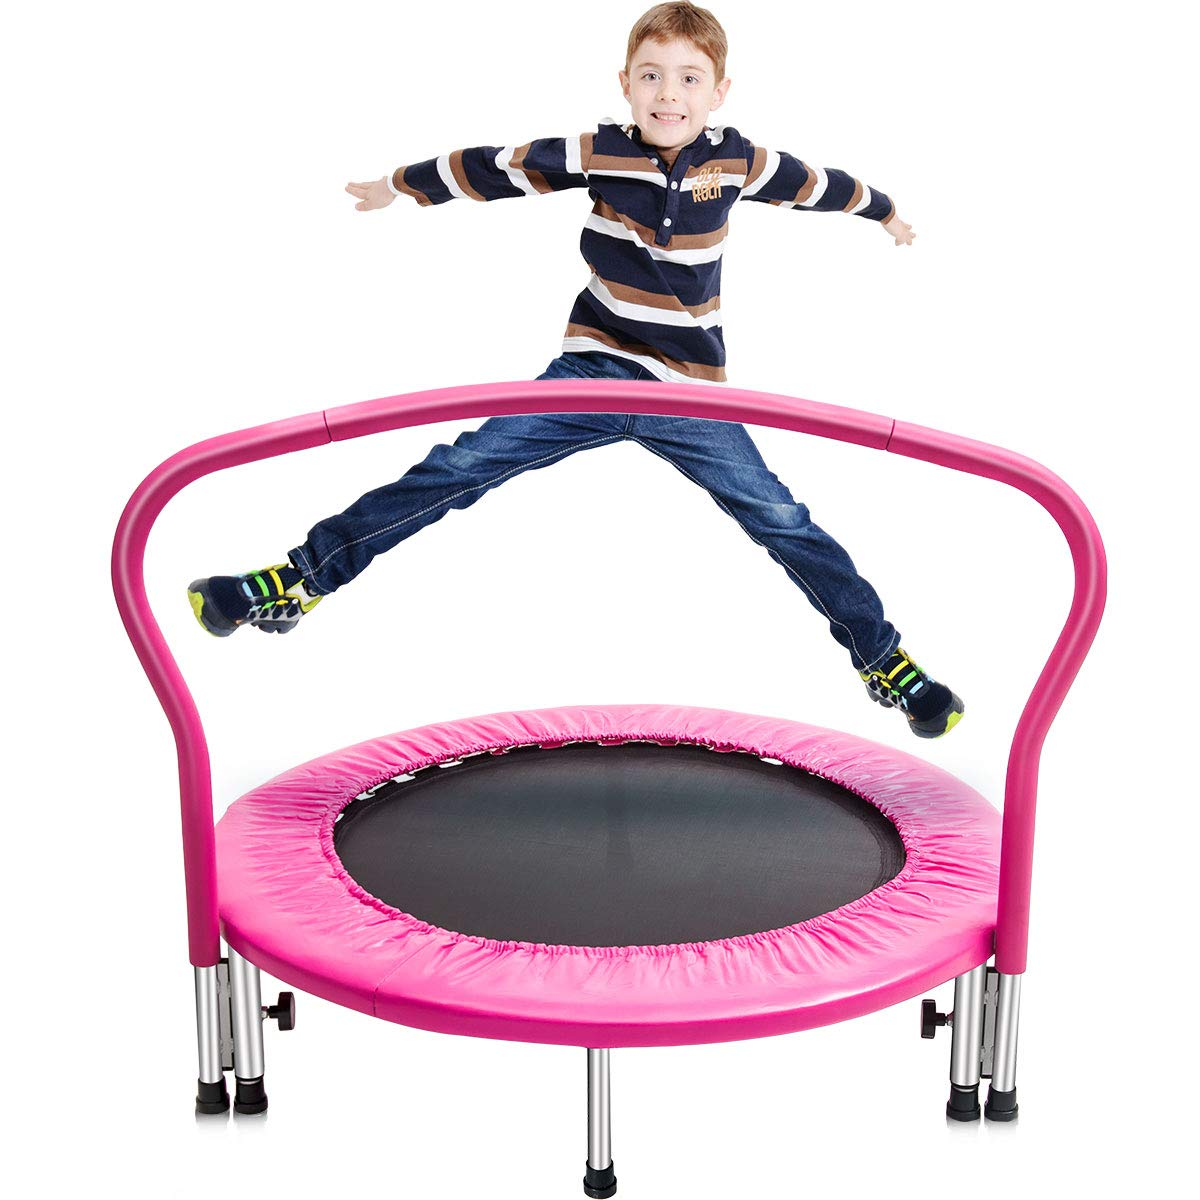 Merax 36'' Kid's Mini Exercise Trampoline Portable Trampoline Toddler Trampoline with Handrail (Pink.Pad)